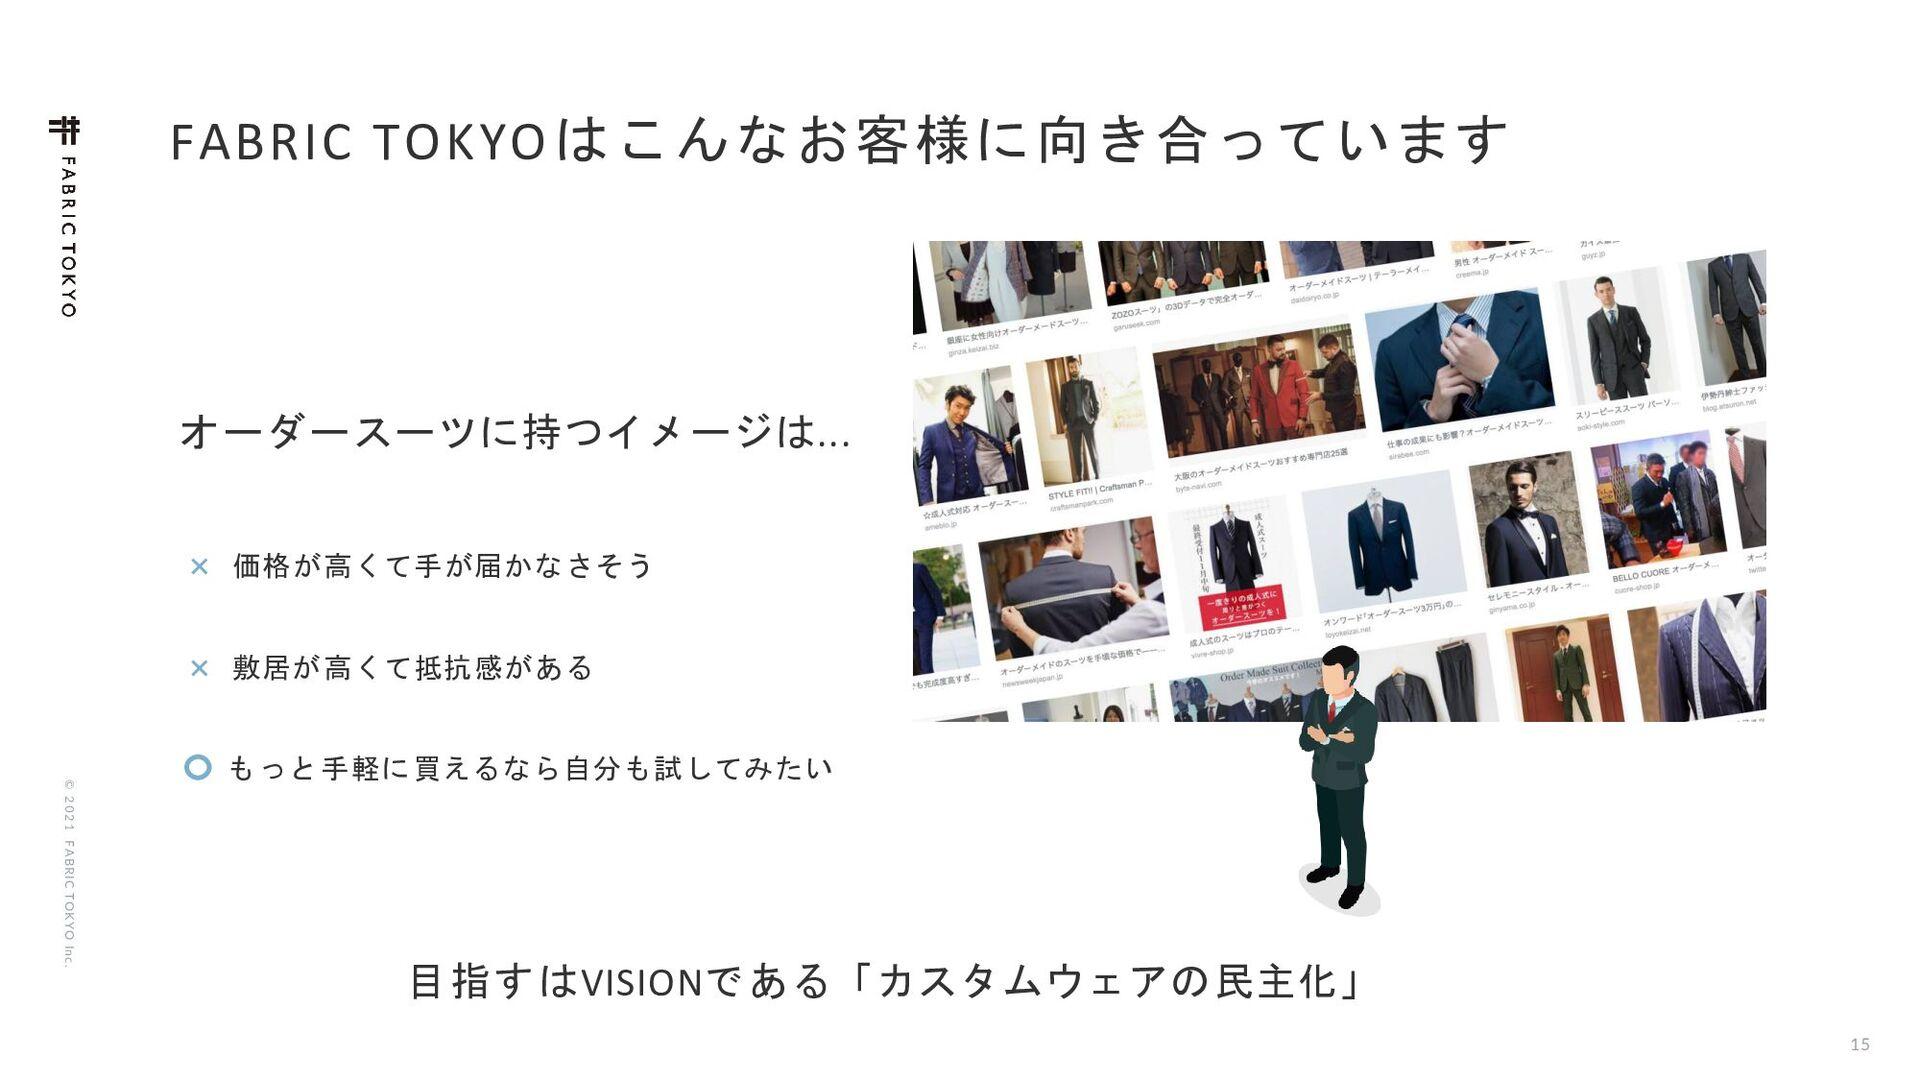 "© 2021 FABRIC TOKYO Inc. 15 '""#3*$50,:0͜Μͳ͓٬༷..."